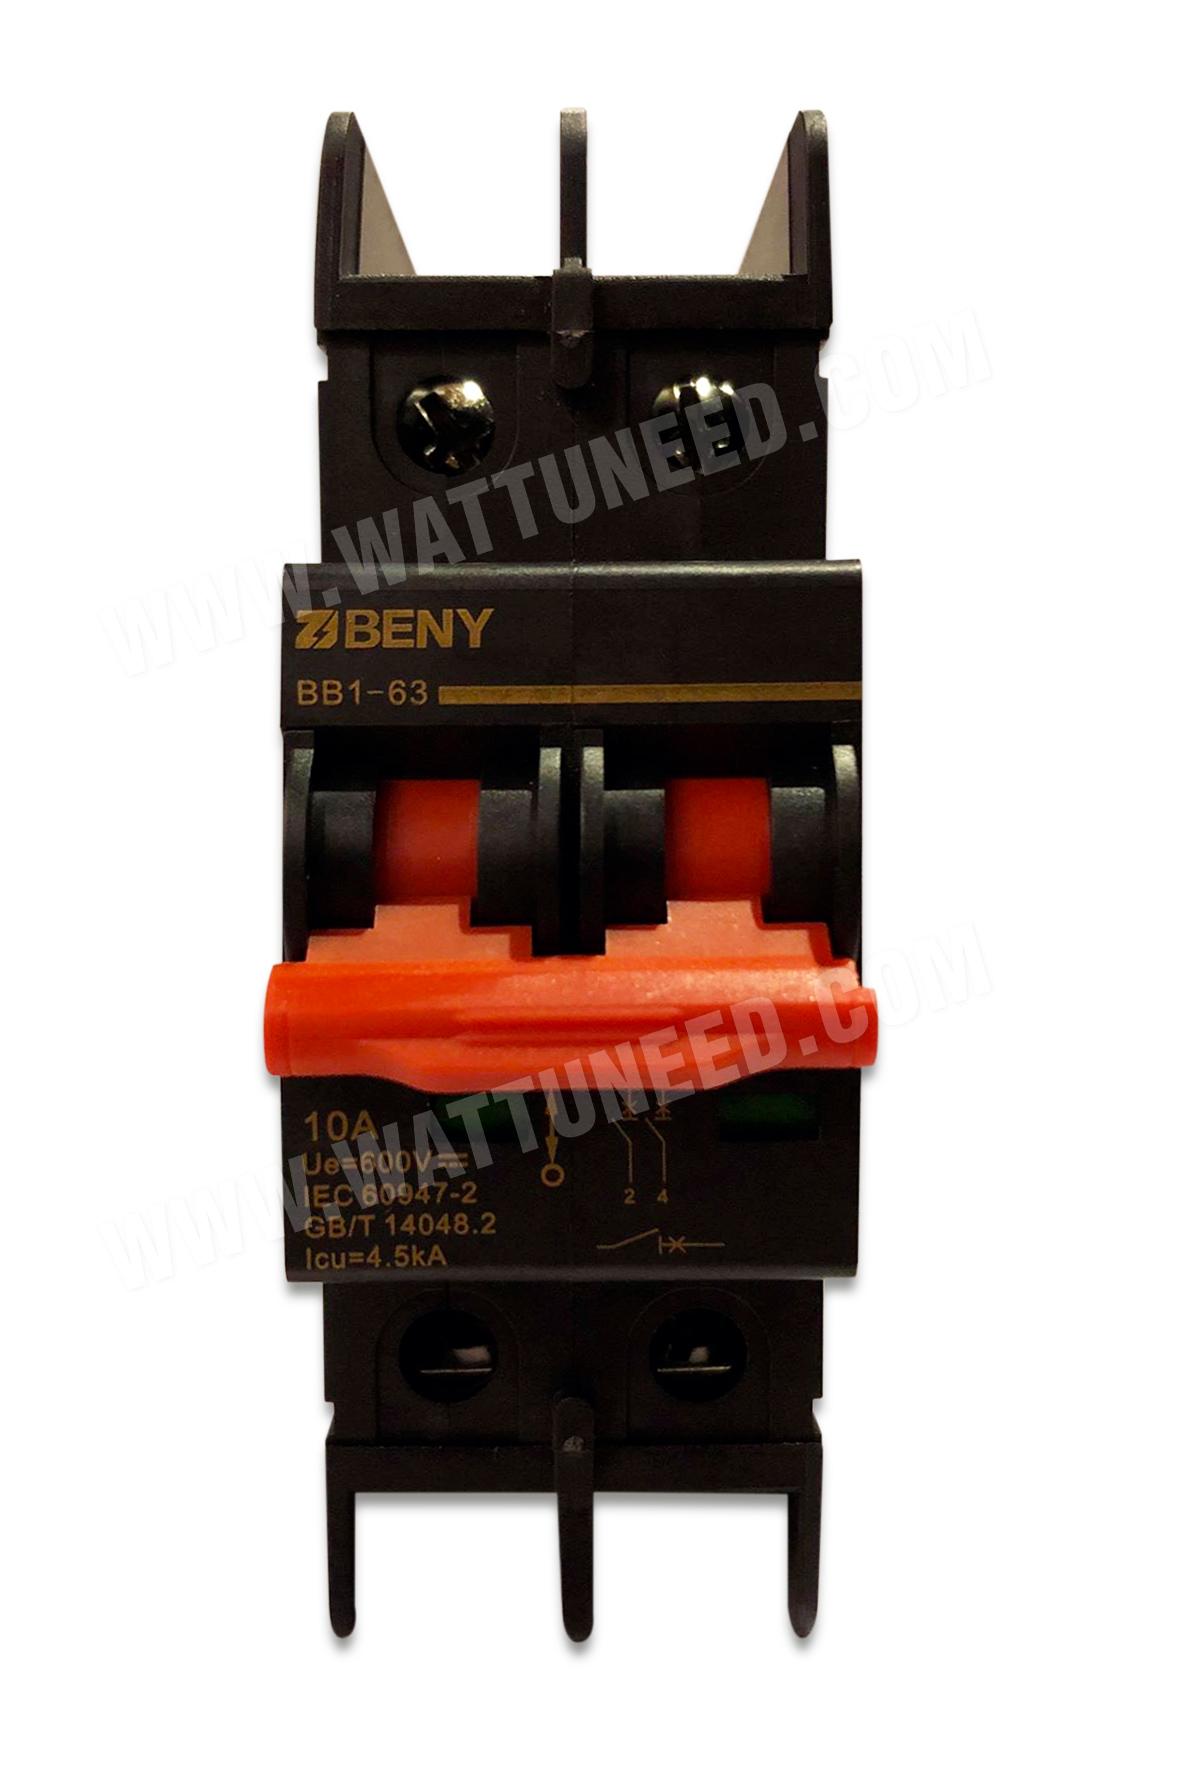 DC circuit breaker 10A - 600 V DC